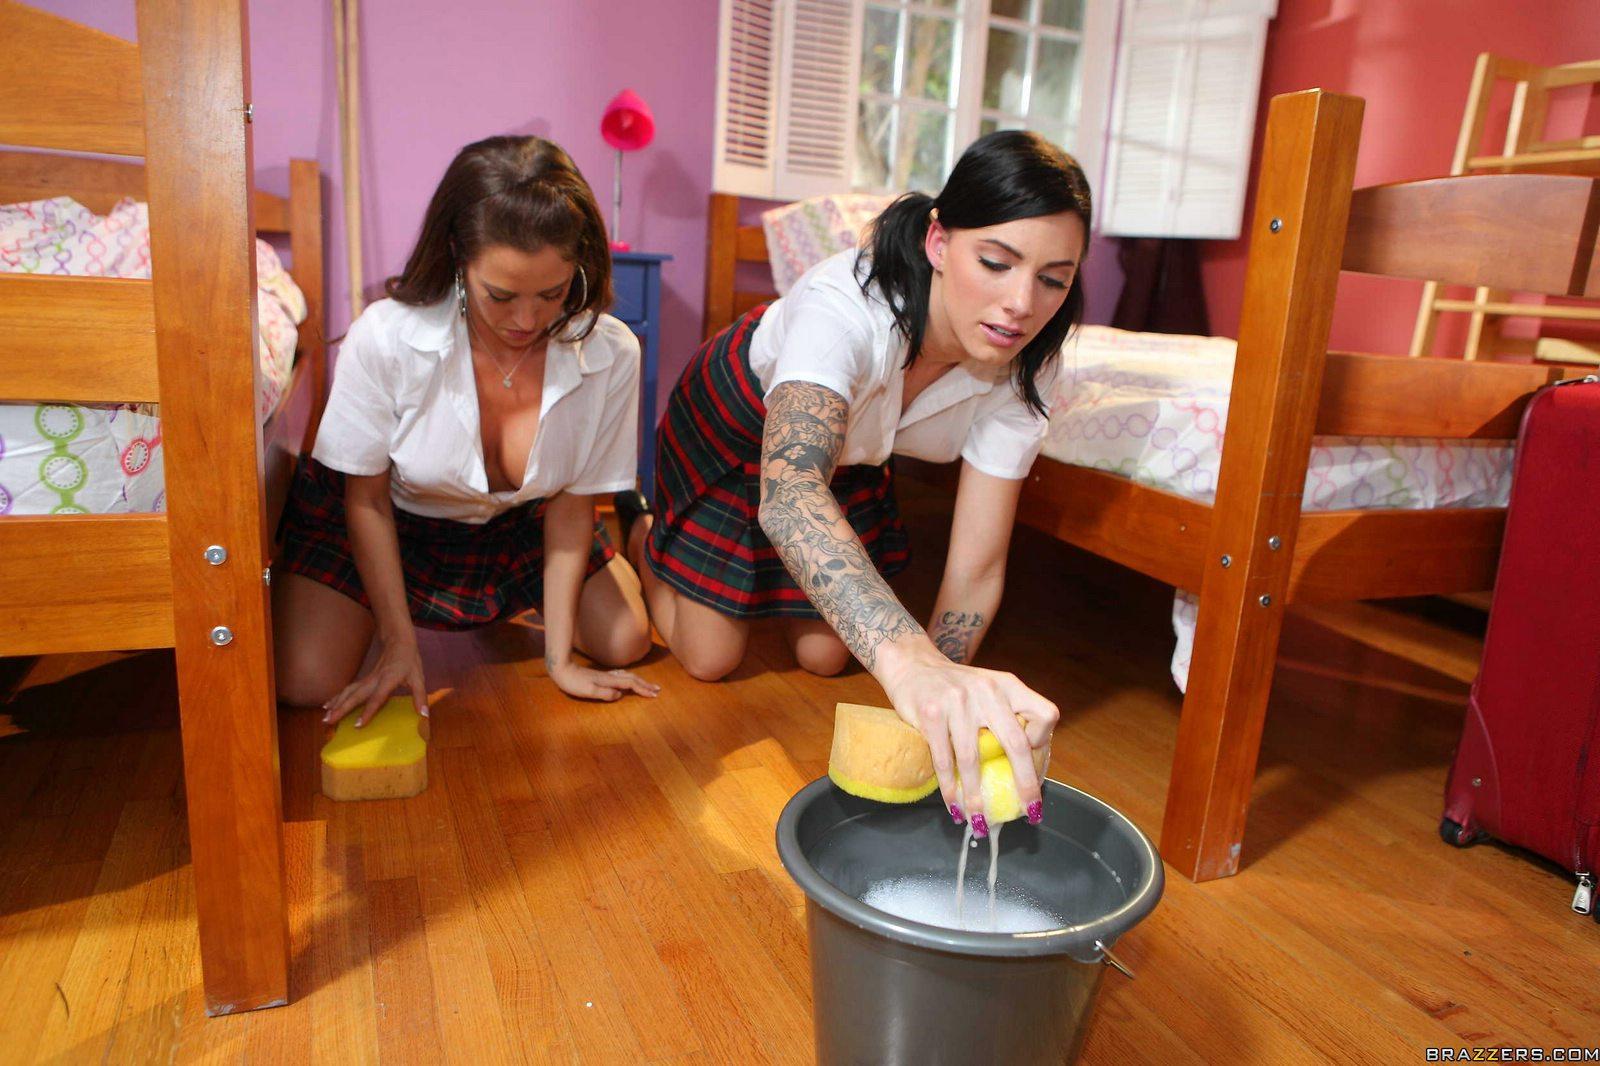 Miss Taylor Wane punishing and fucking two schoolgirls.